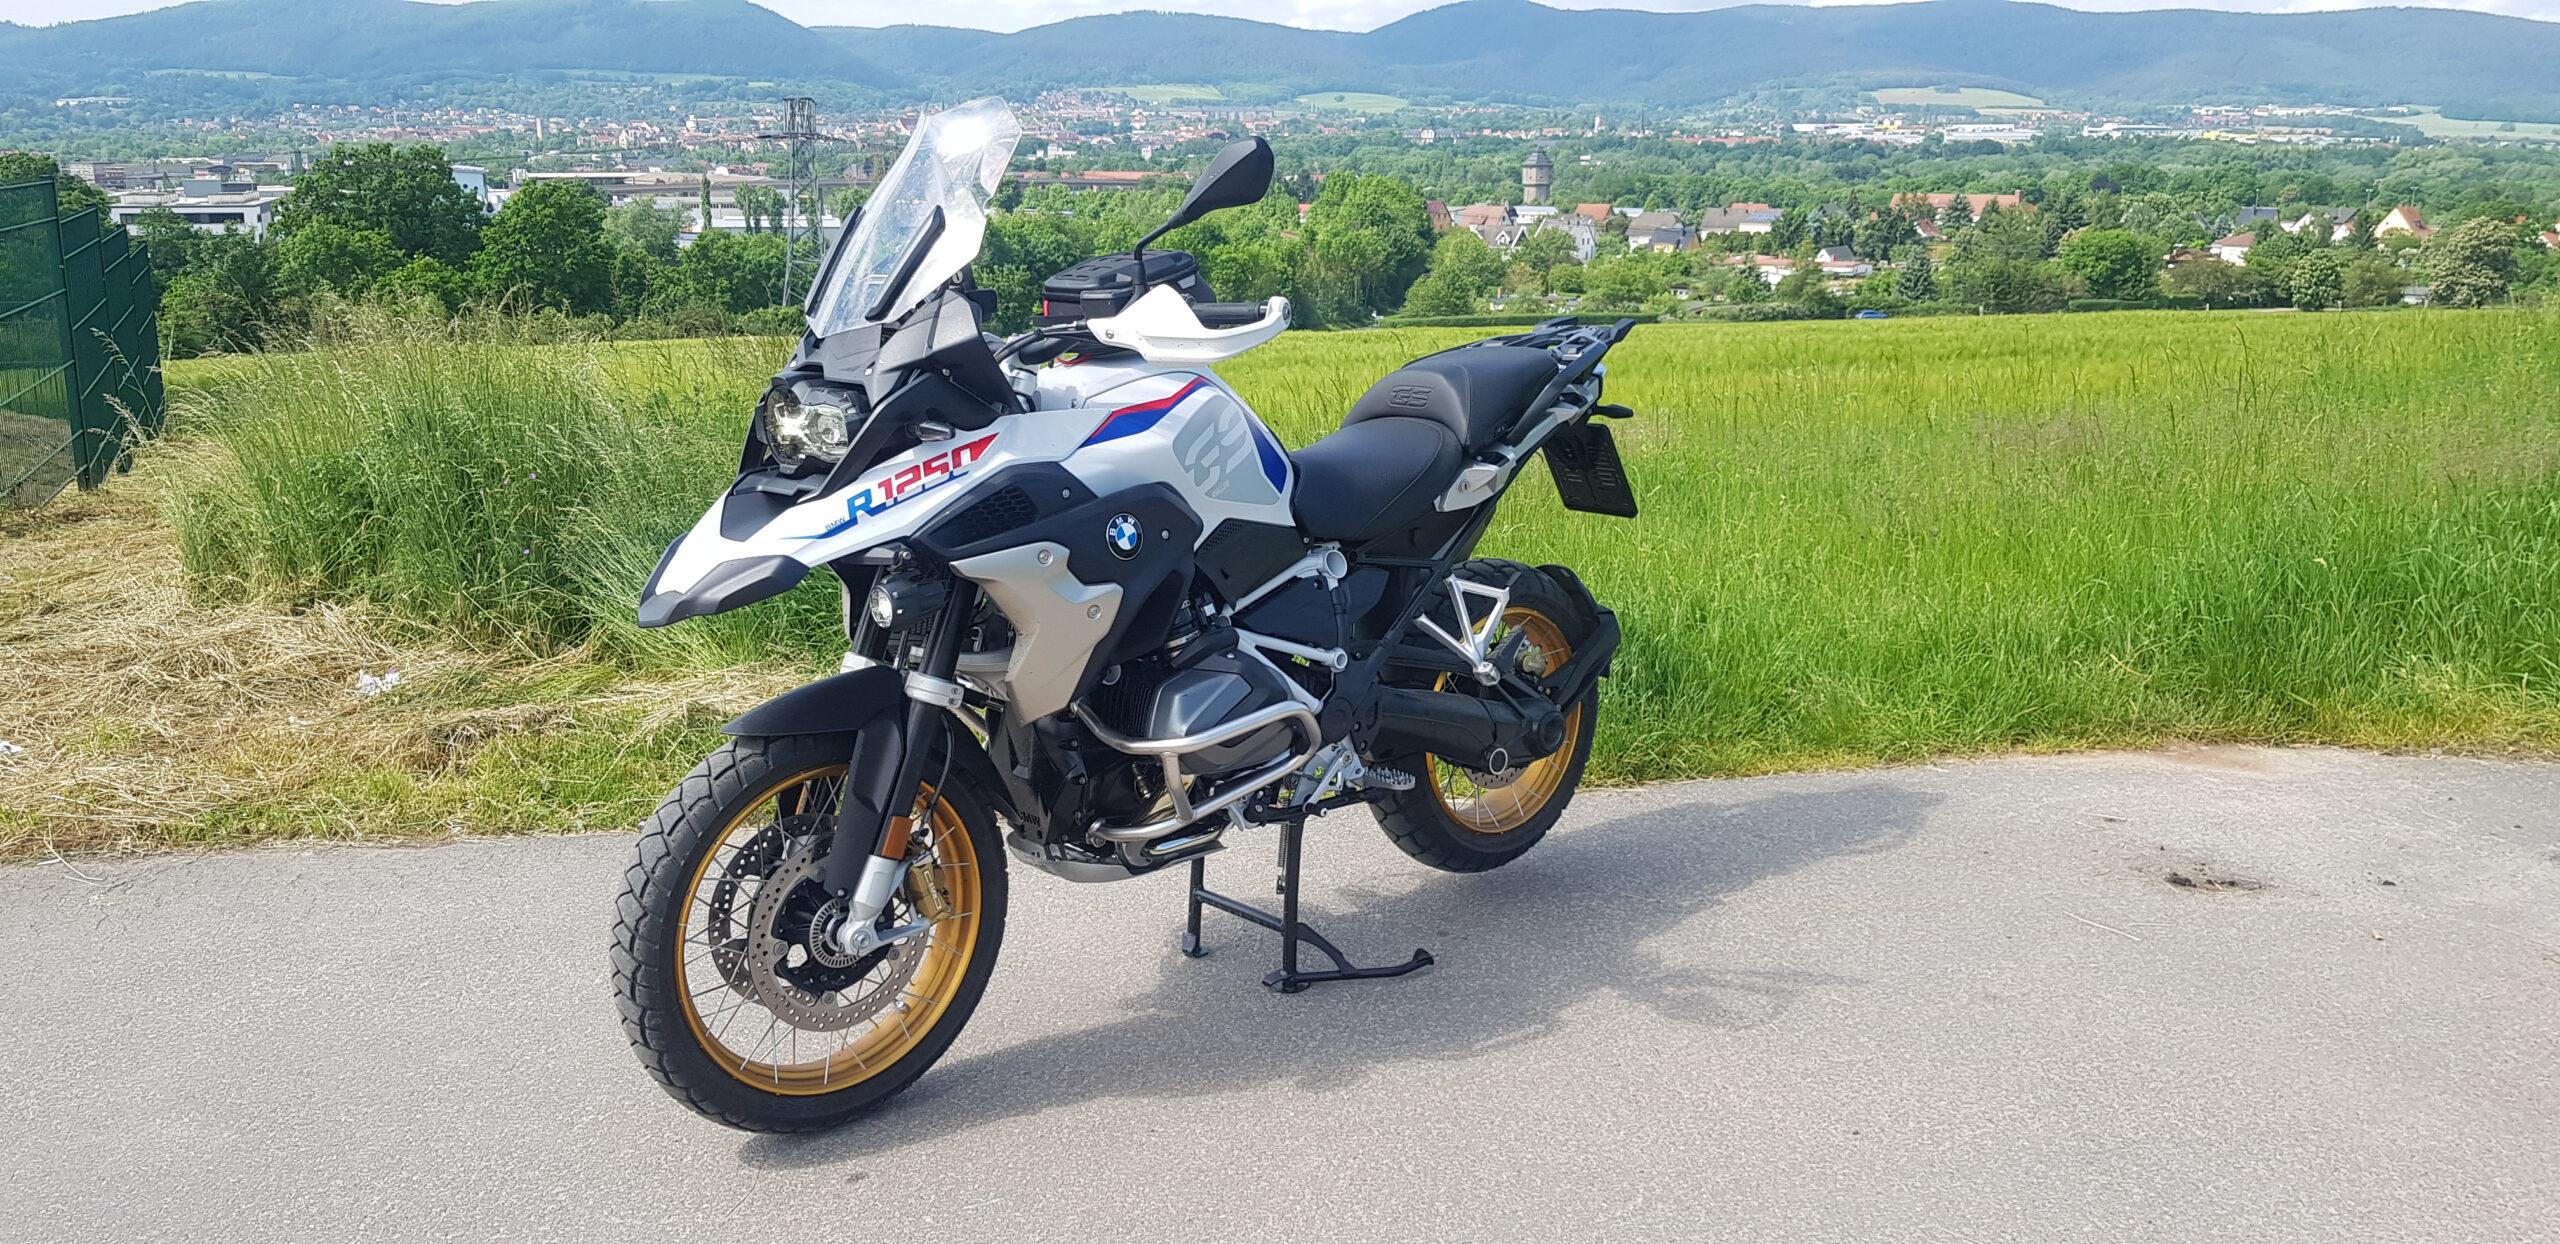 BMW R1250 GS, Klasse A, 136 PS, Begleitfahrzeug Fahrlehrer, Bike to Bike - Ausbildung